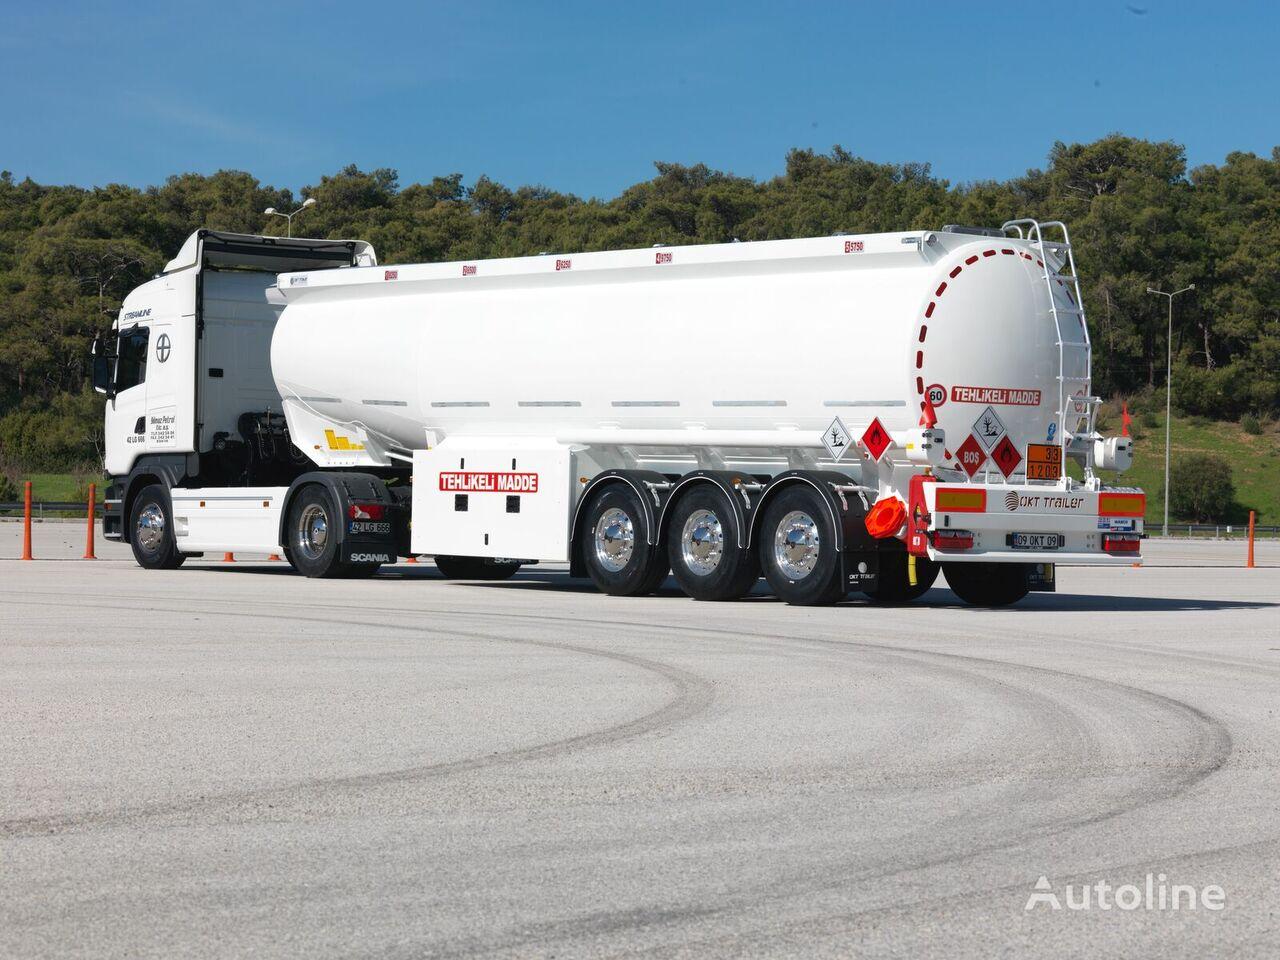 naujas naftos produktų cisterna OKT TRAILER 38 m3 CONICAL TANKER